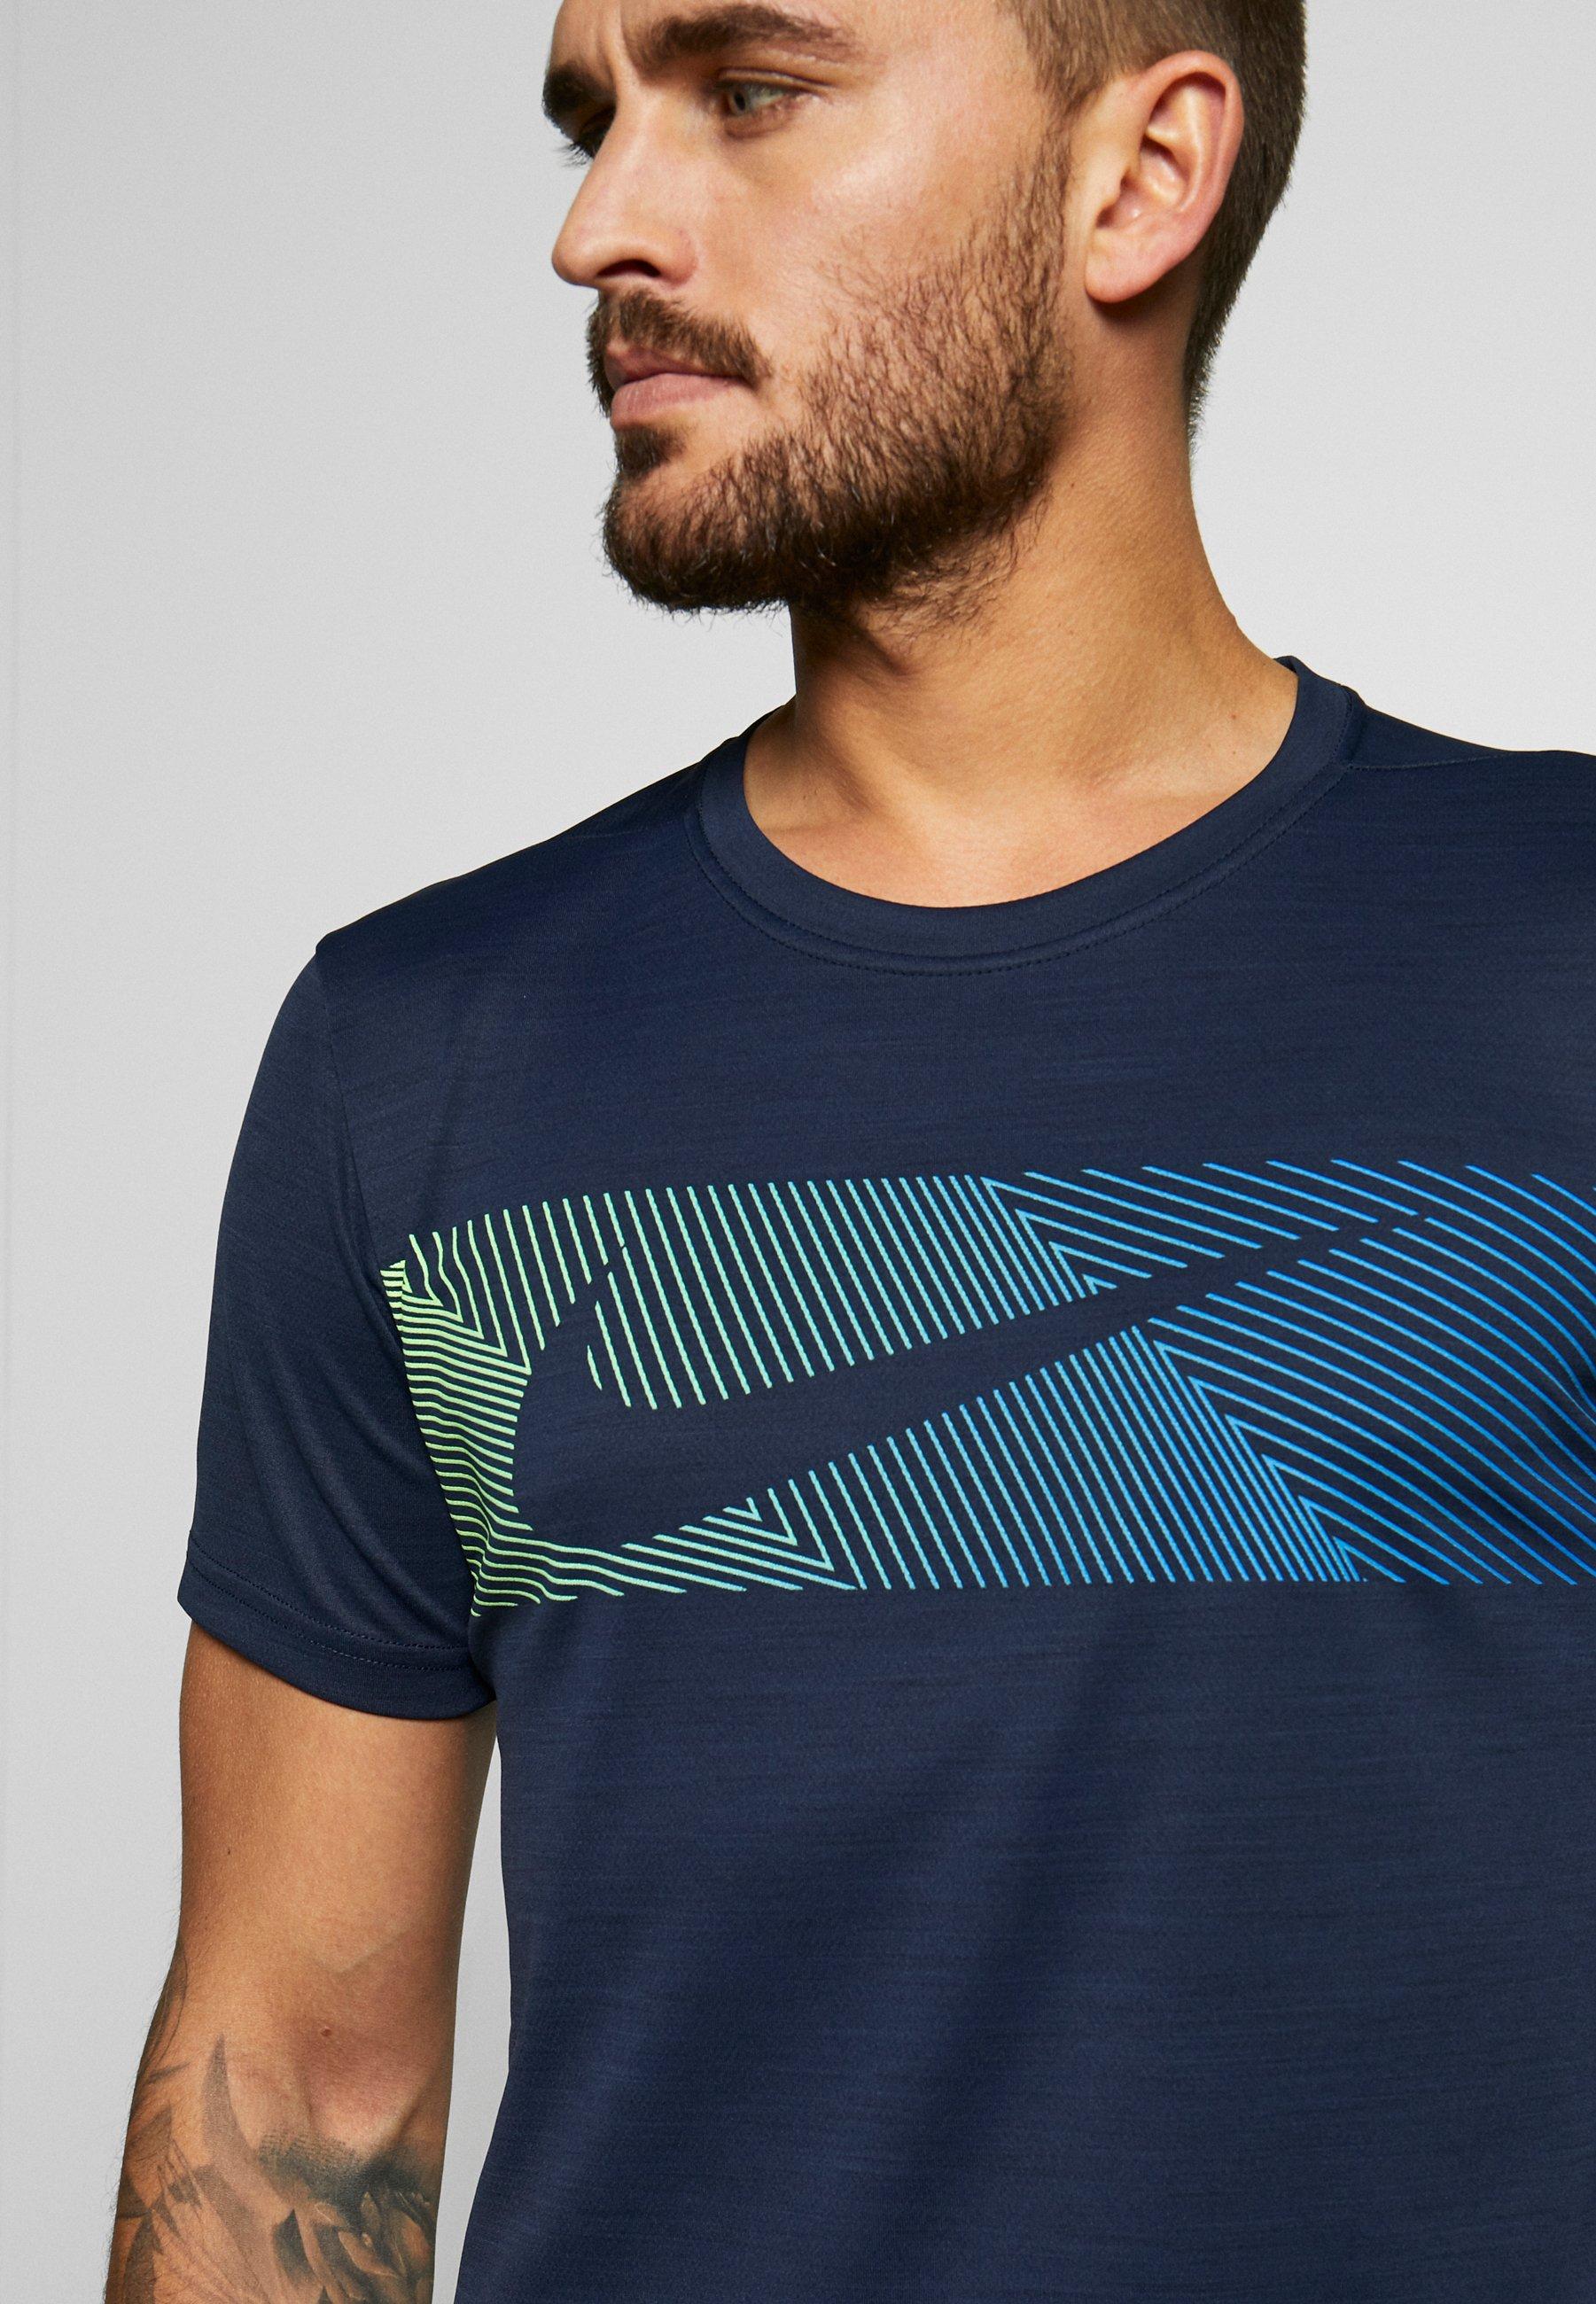 DRY SUPERSET T shirt imprimé obsidianwhite